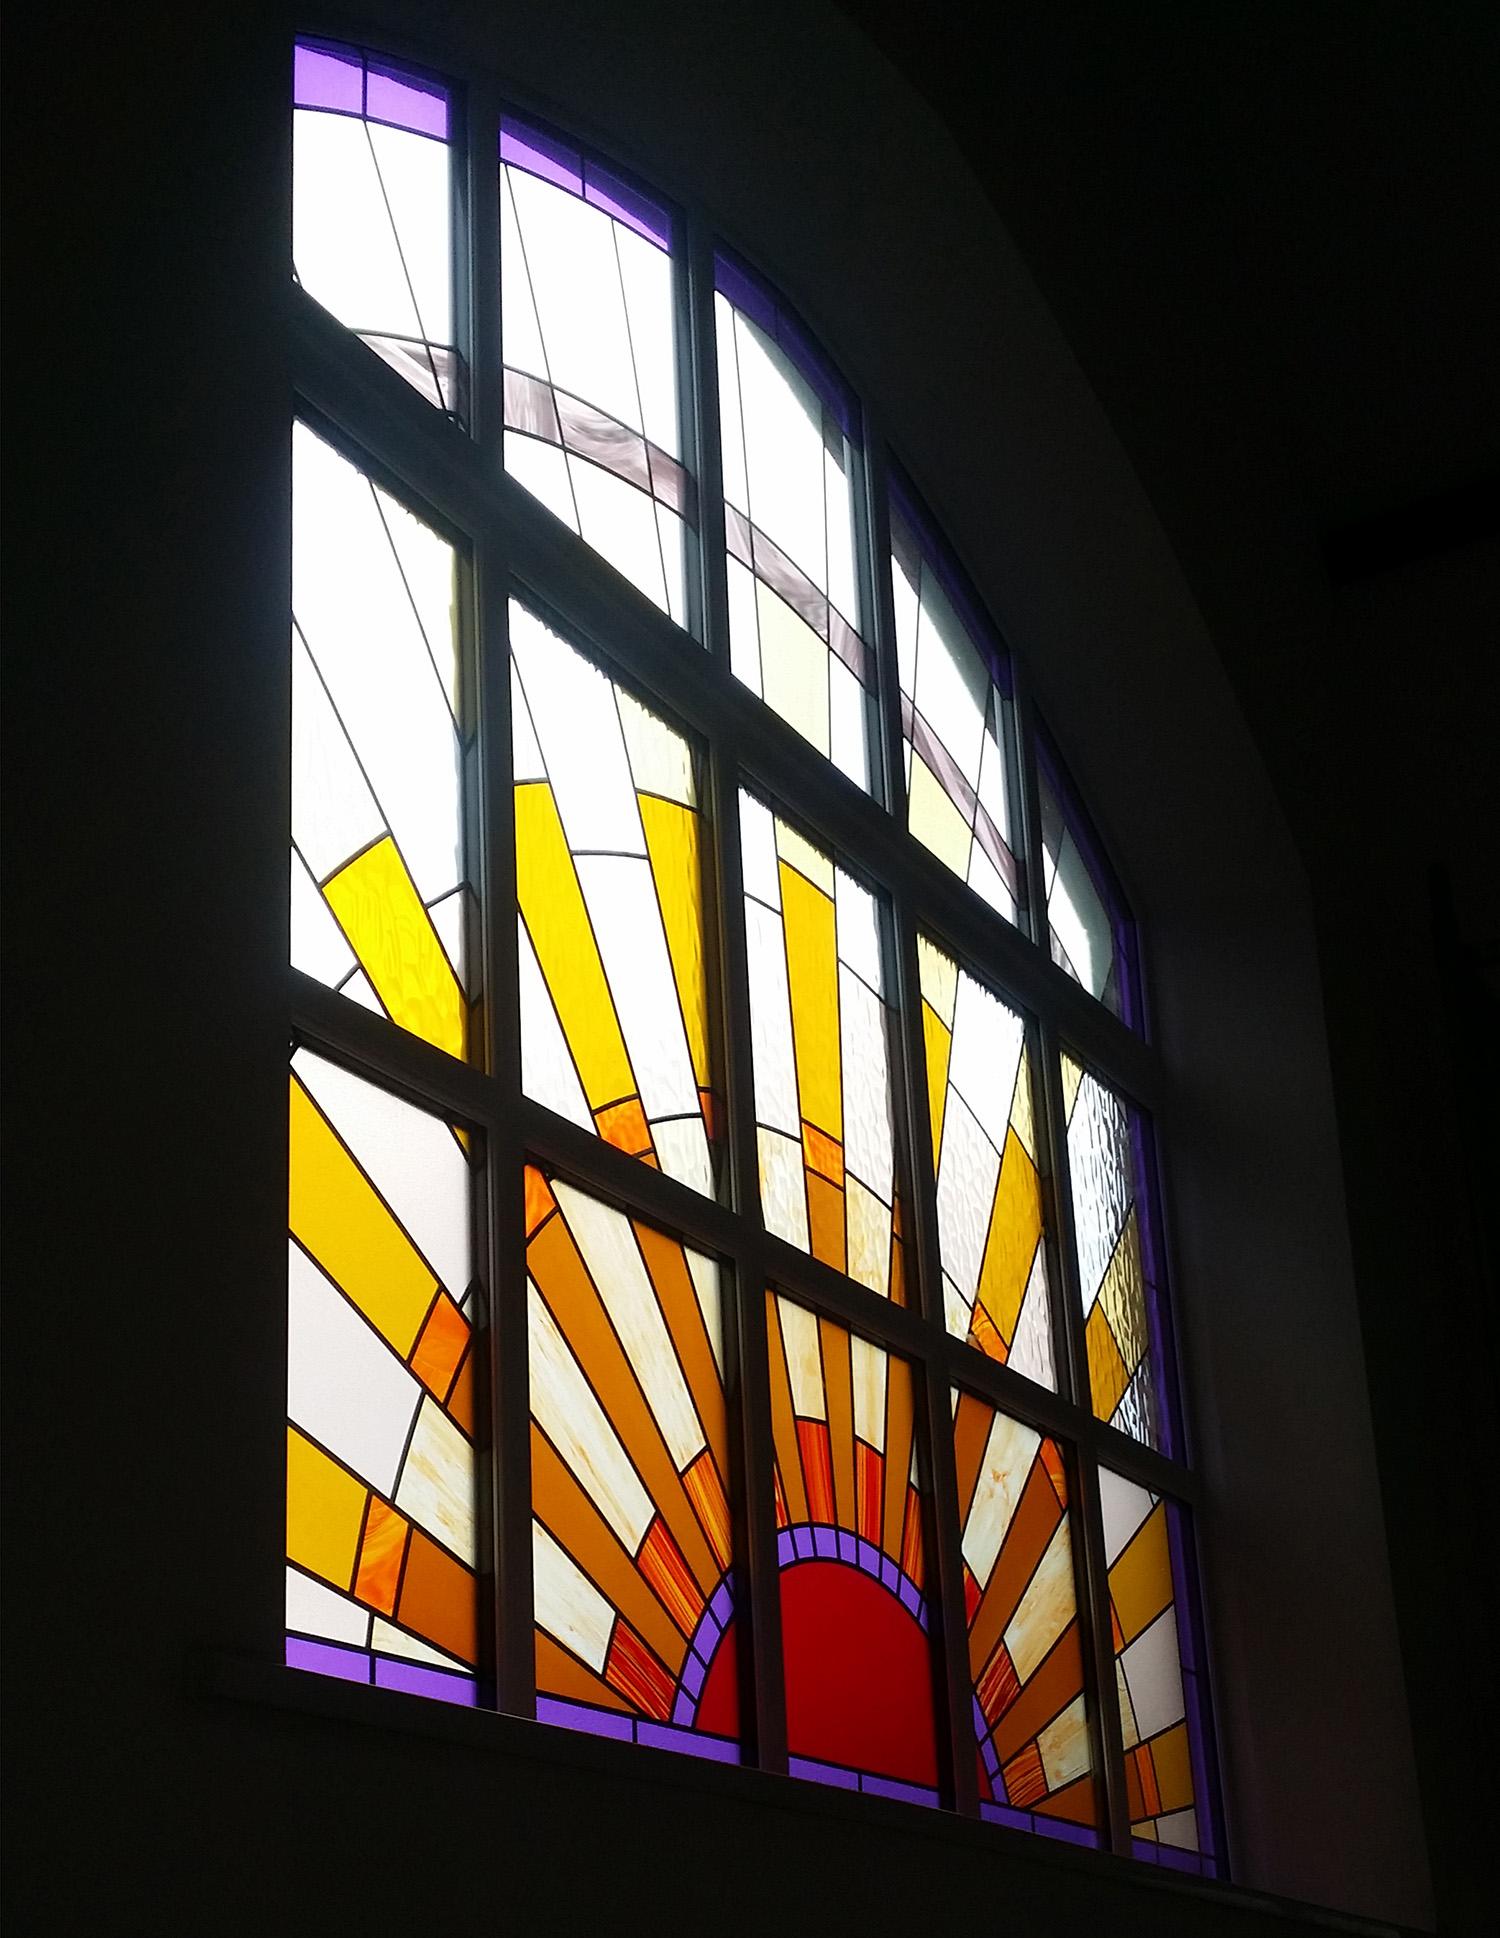 Large Sunburst Window in Chapel Conversion